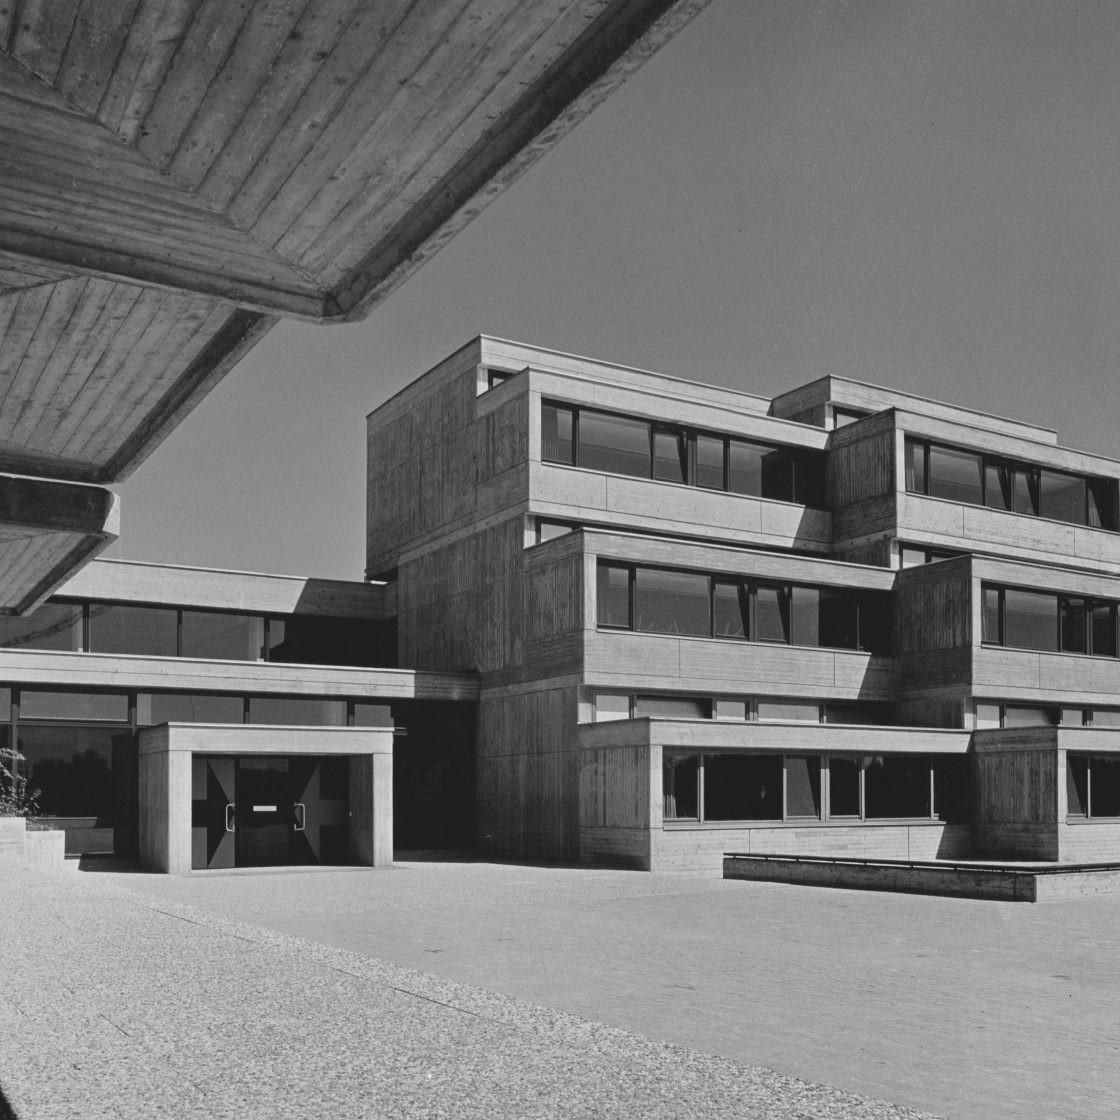 Harald Deilmann: Realschule Lemgo, 1964-1969 - Abb: Baukunstarchiv NRW, Nachlass Harald Deilmann, Foto: Friedhelm Thomas